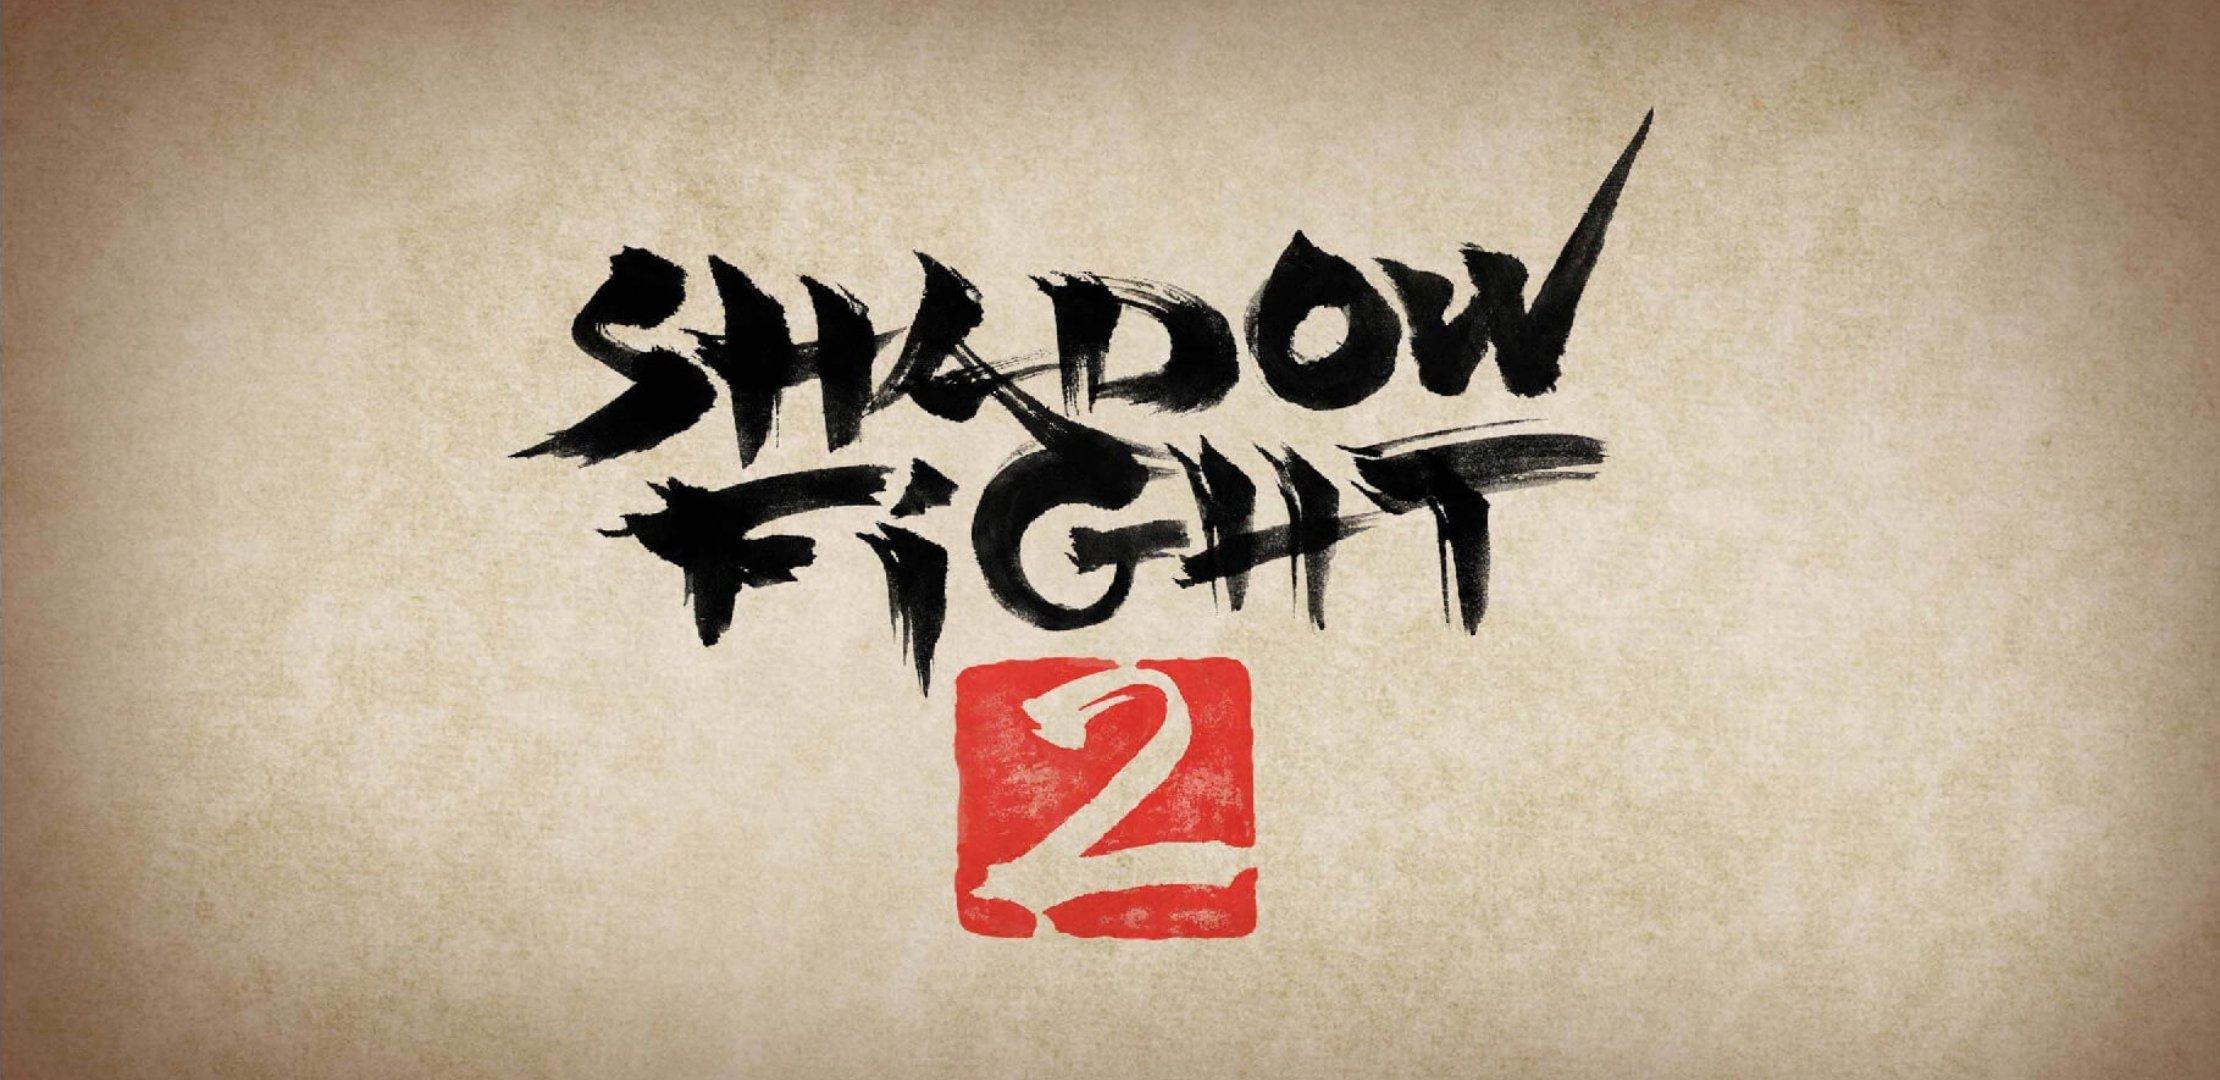 shadow fight 2 windows 10